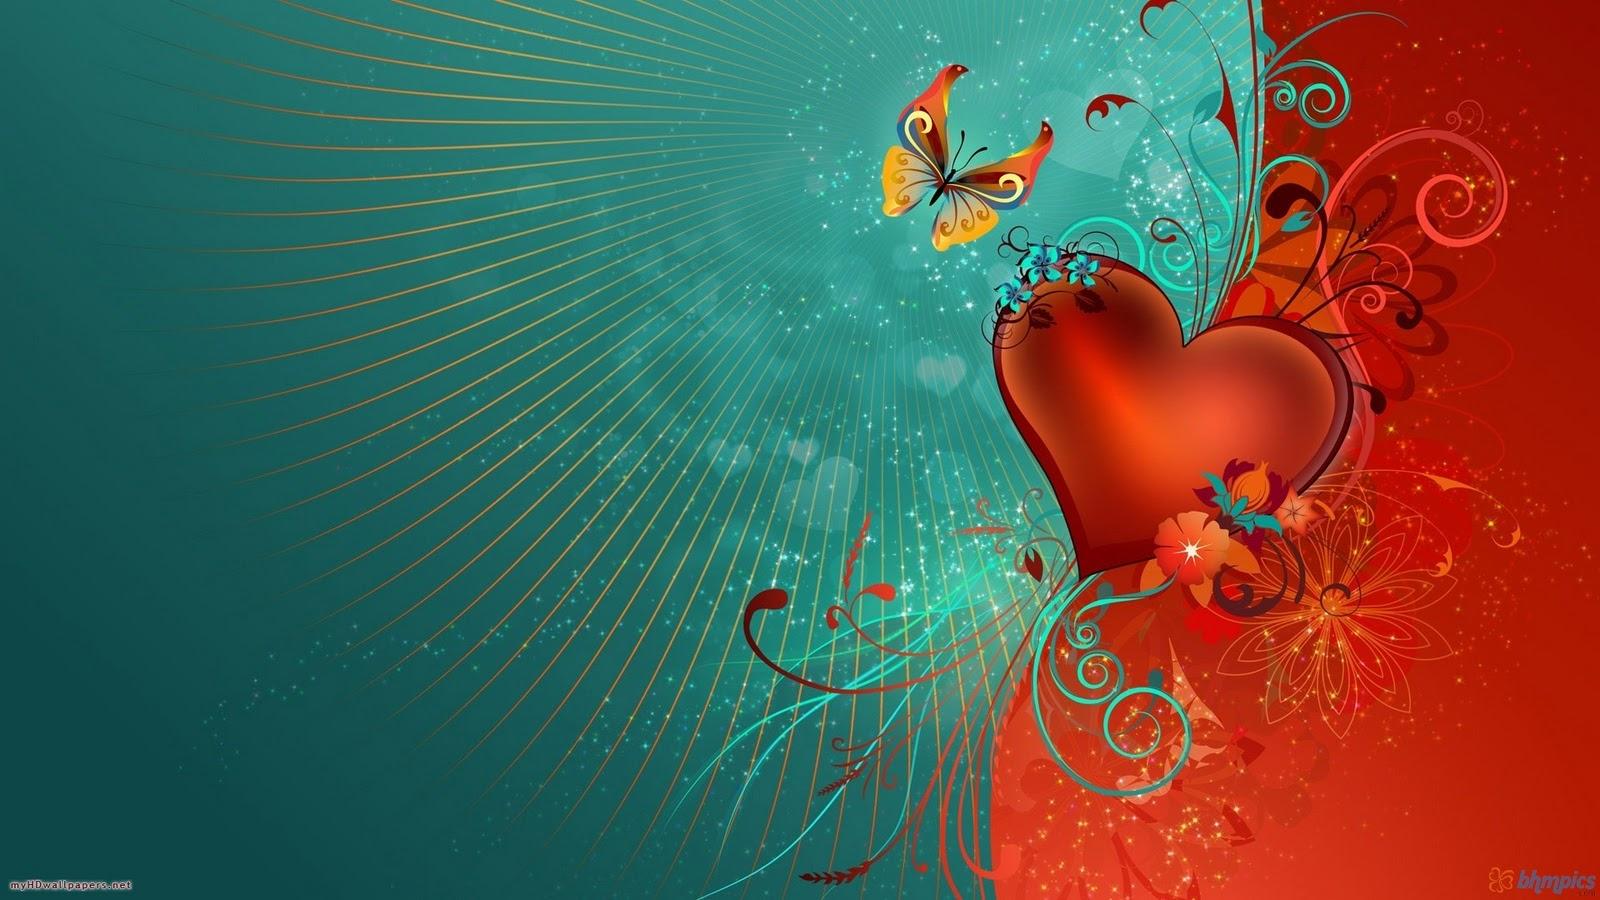 http://1.bp.blogspot.com/-hcHRm-aDDZI/TucnTRendiI/AAAAAAAAAaU/HekIDDnNPow/s1600/valentines_heart_wallpaper-1920x1080.jpg